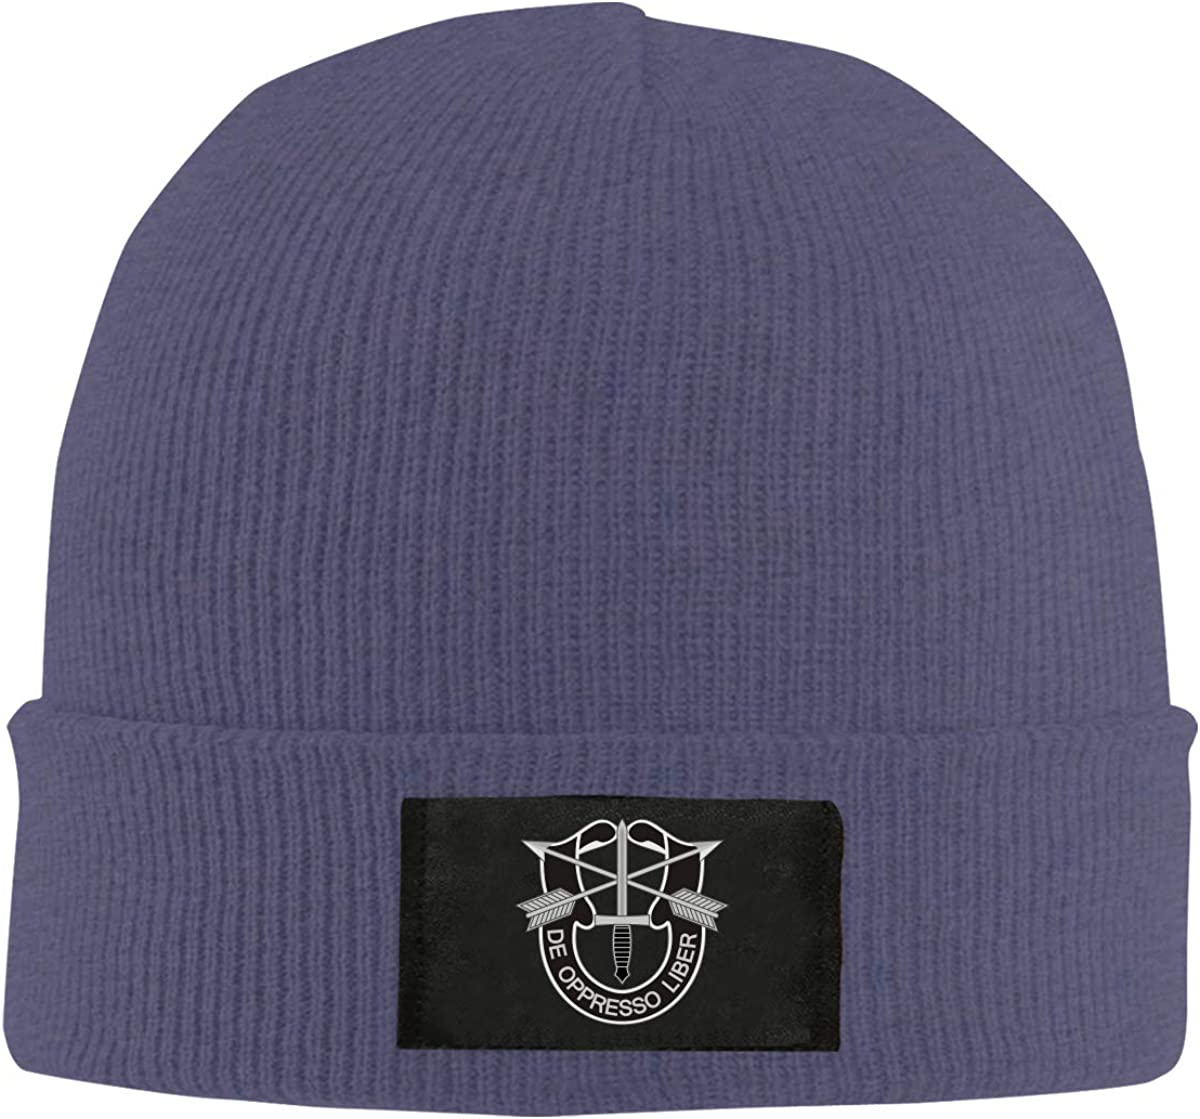 Army Special Forces Logo Unisex Warm Winter Hat Knit Beanie Skull Cap Cuff Beanie Hat Winter Hats